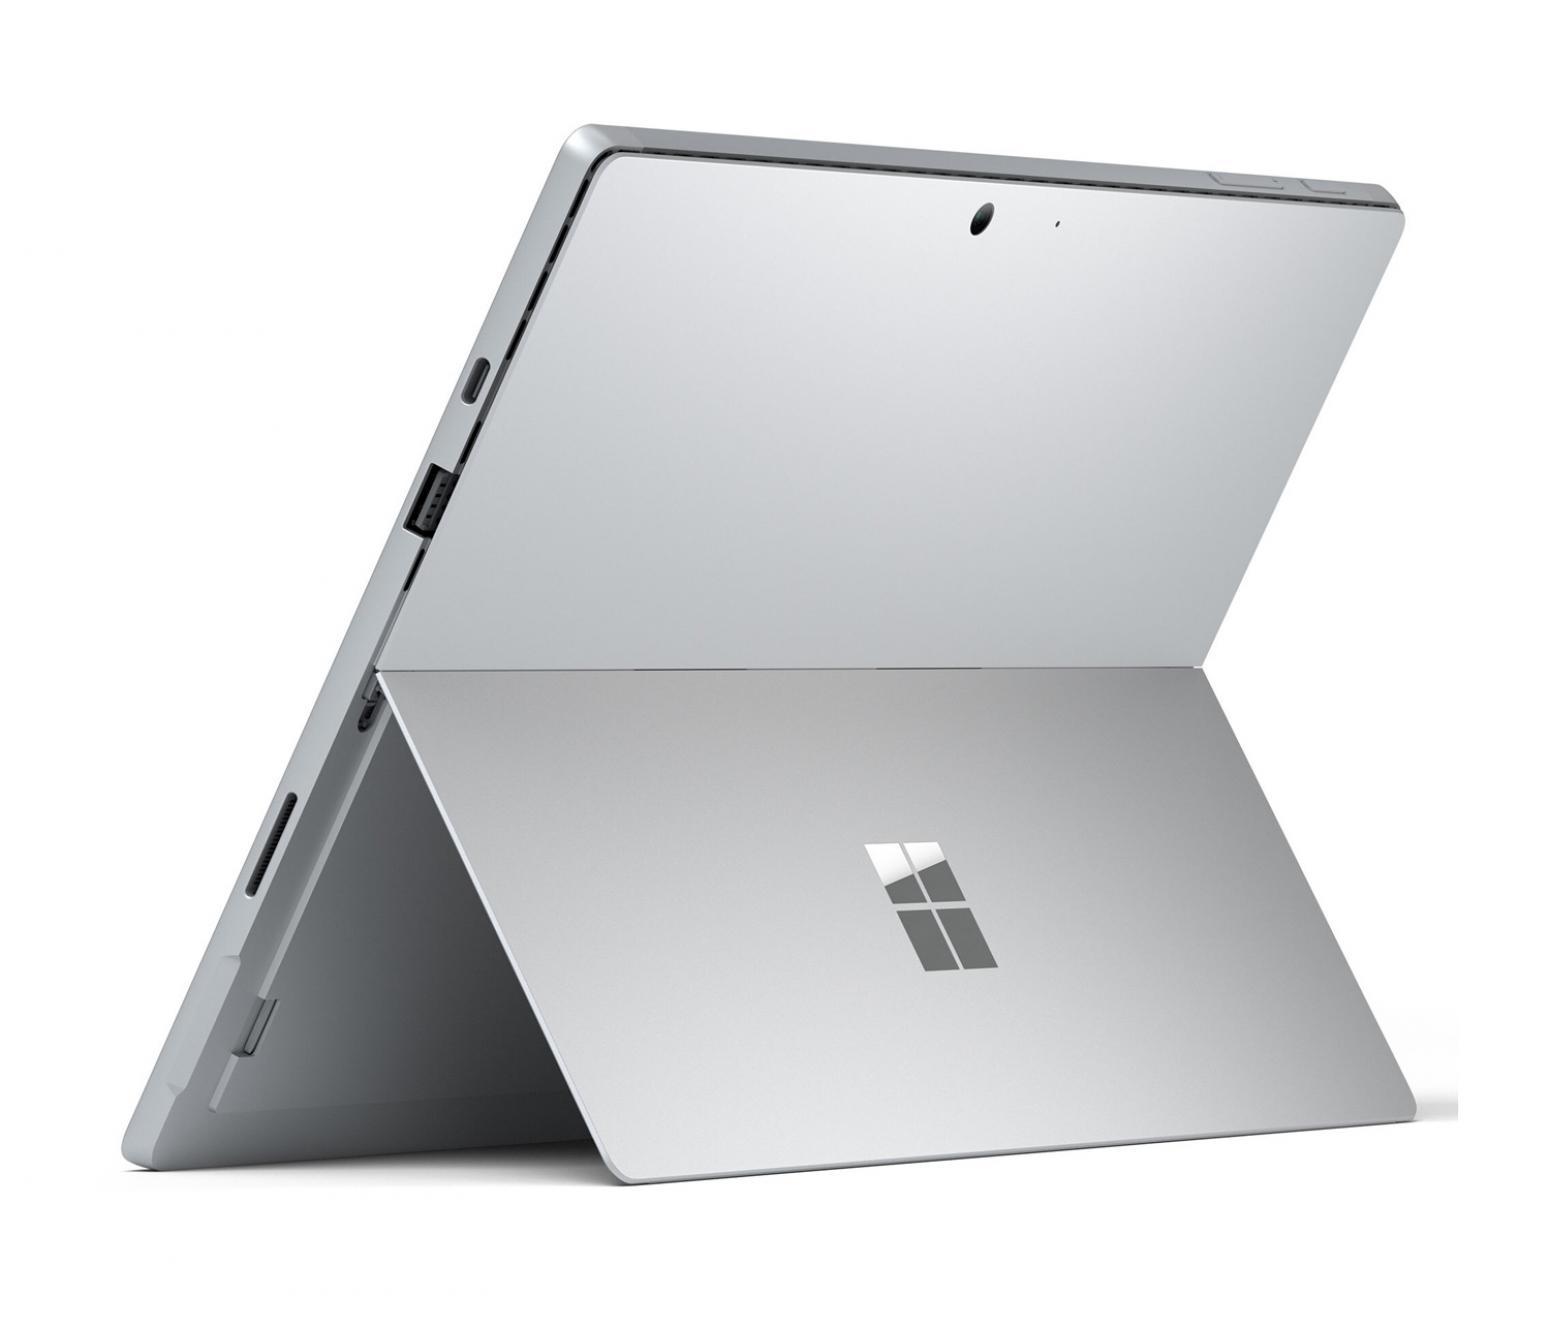 Ordinateur portable Microsoft Surface Pro 7 - Core i5, 8 Go, 256 Go - photo 5